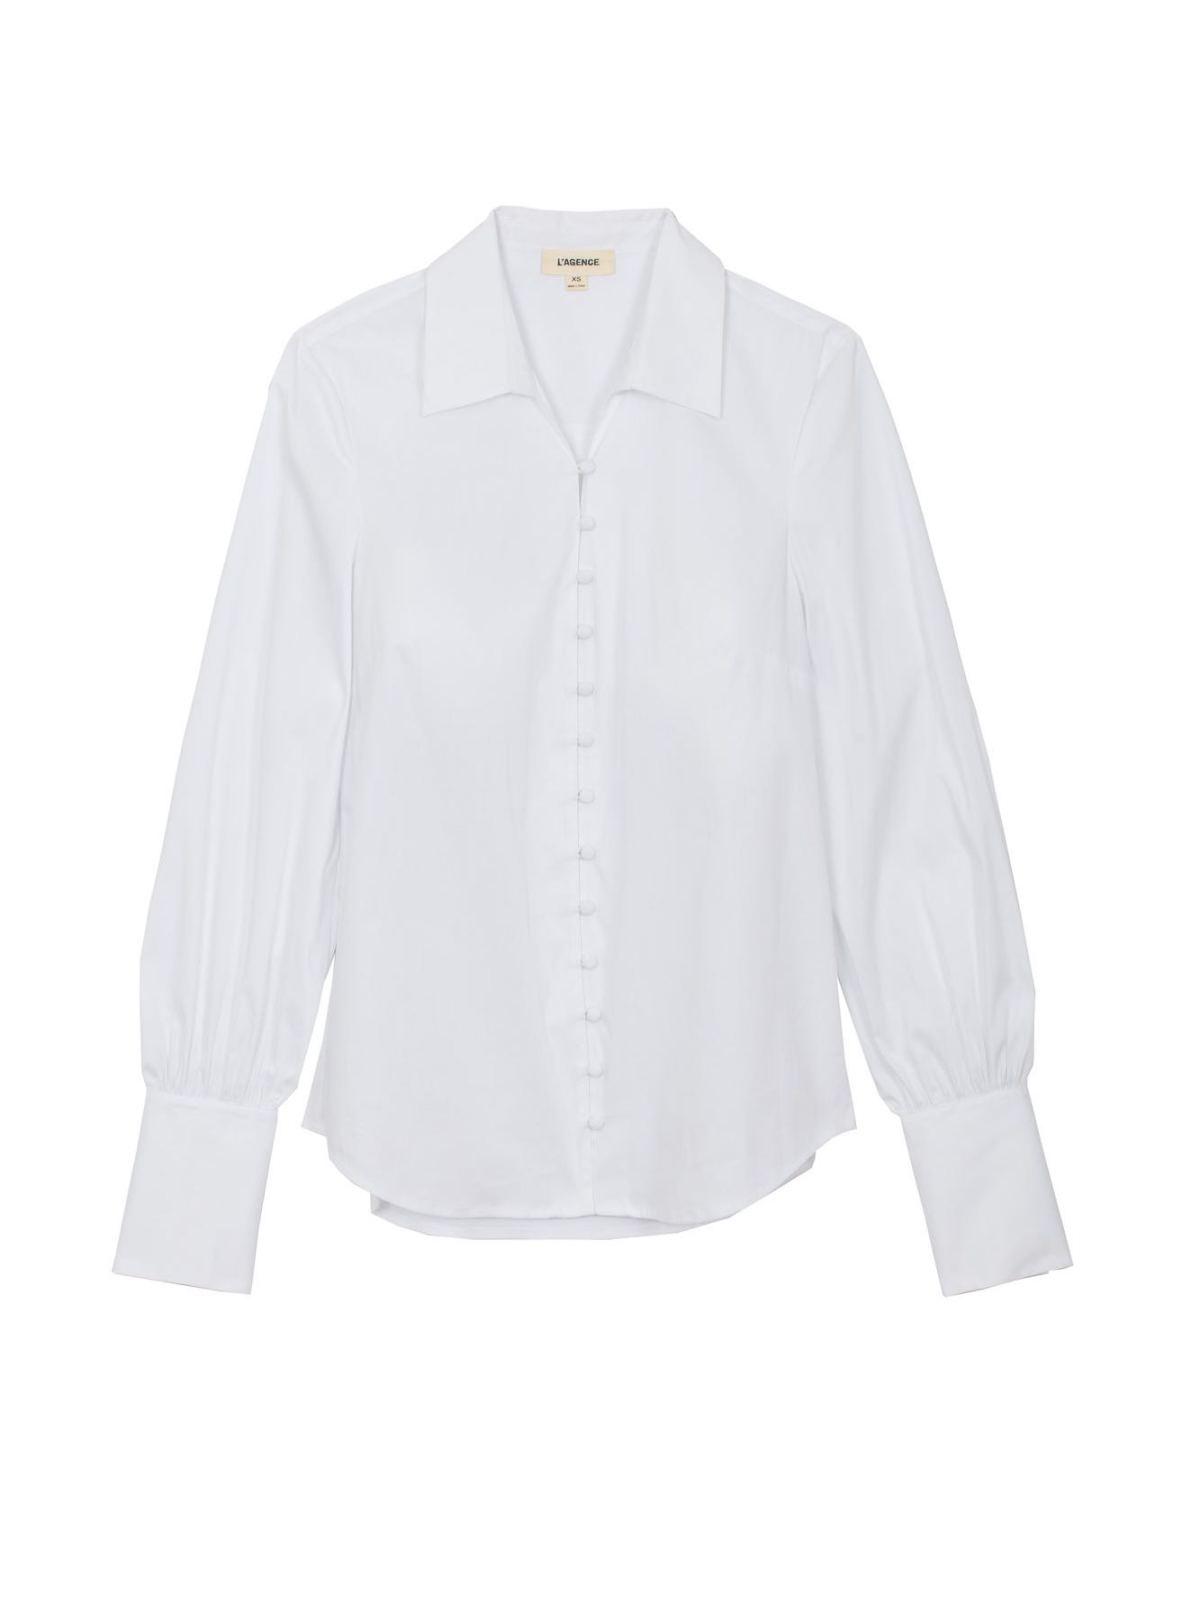 4847_pop_naomi_poplin_poofy_sleeve_blouse_white_1_Edit.1200w.jpg